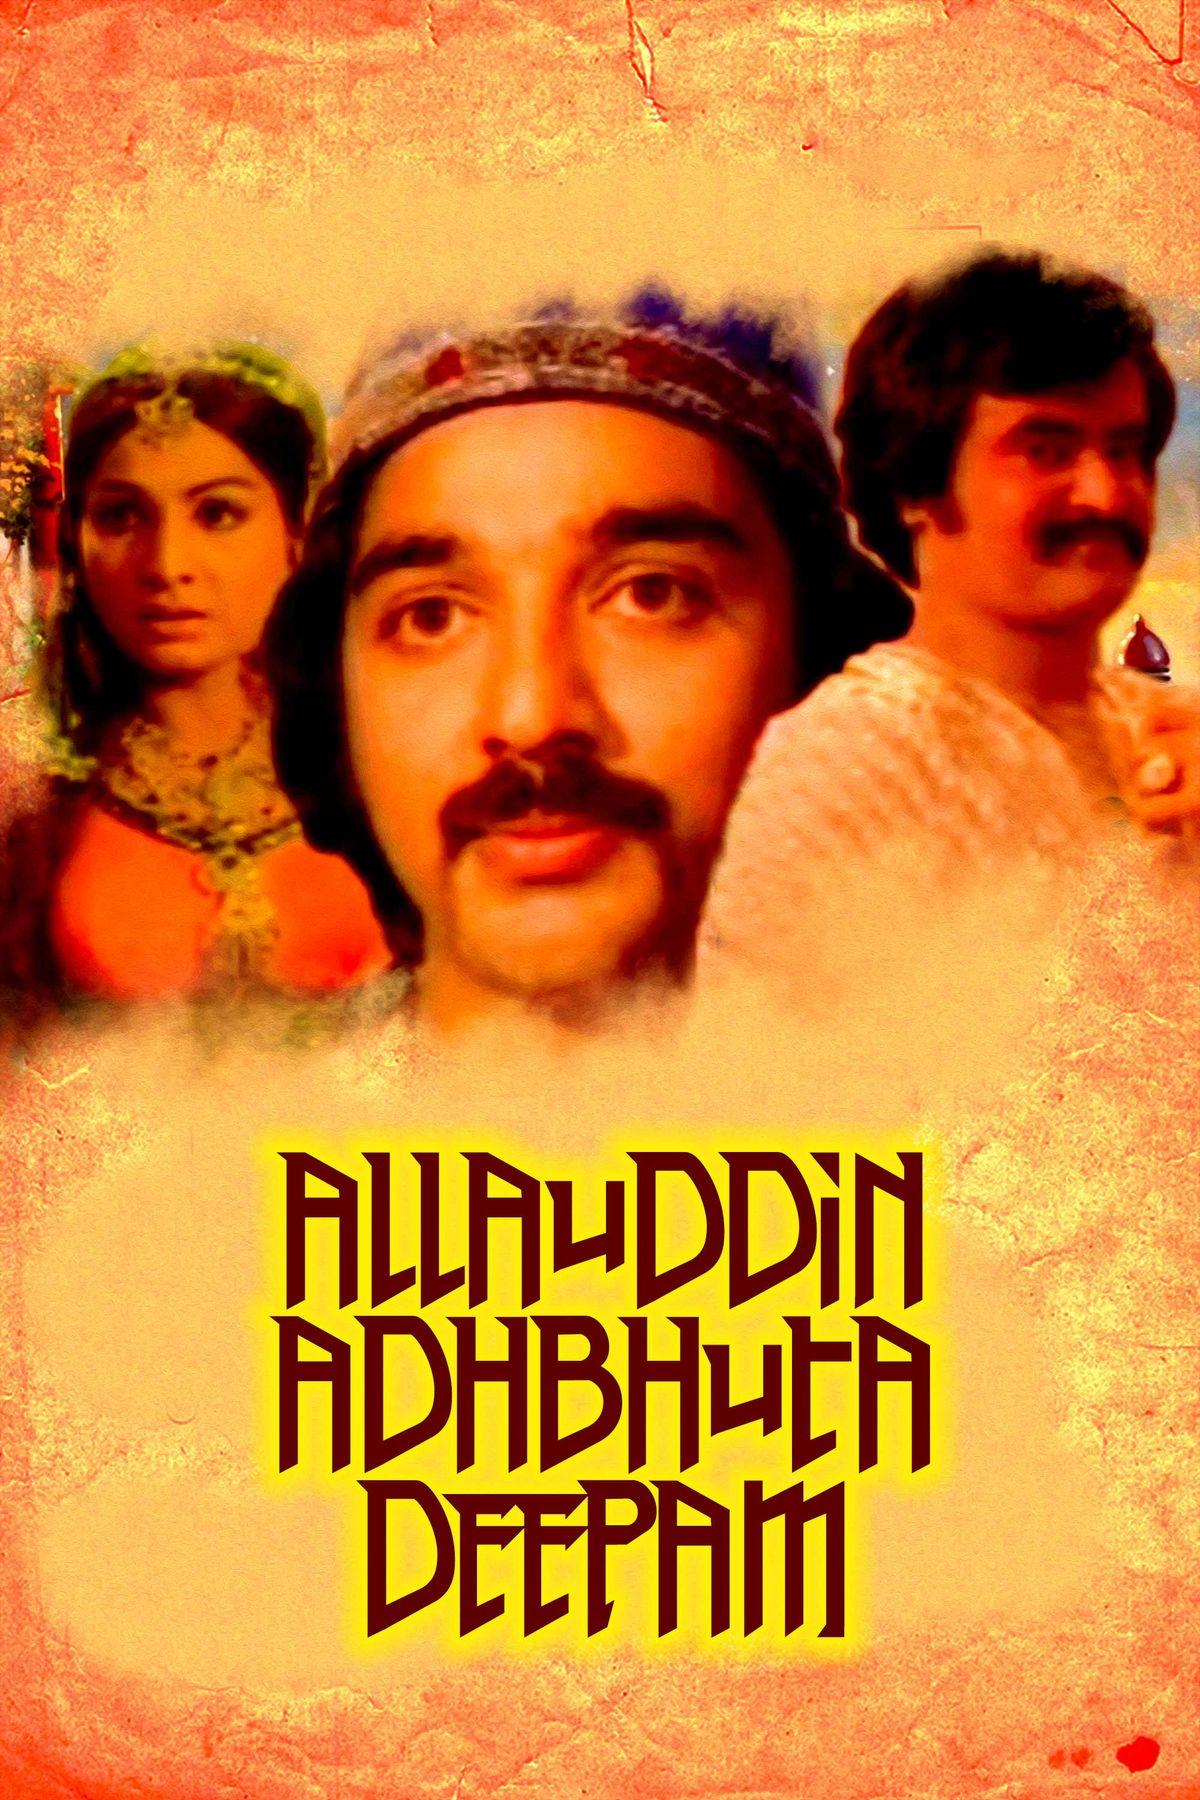 Allauddin Adhbhuta Deepam